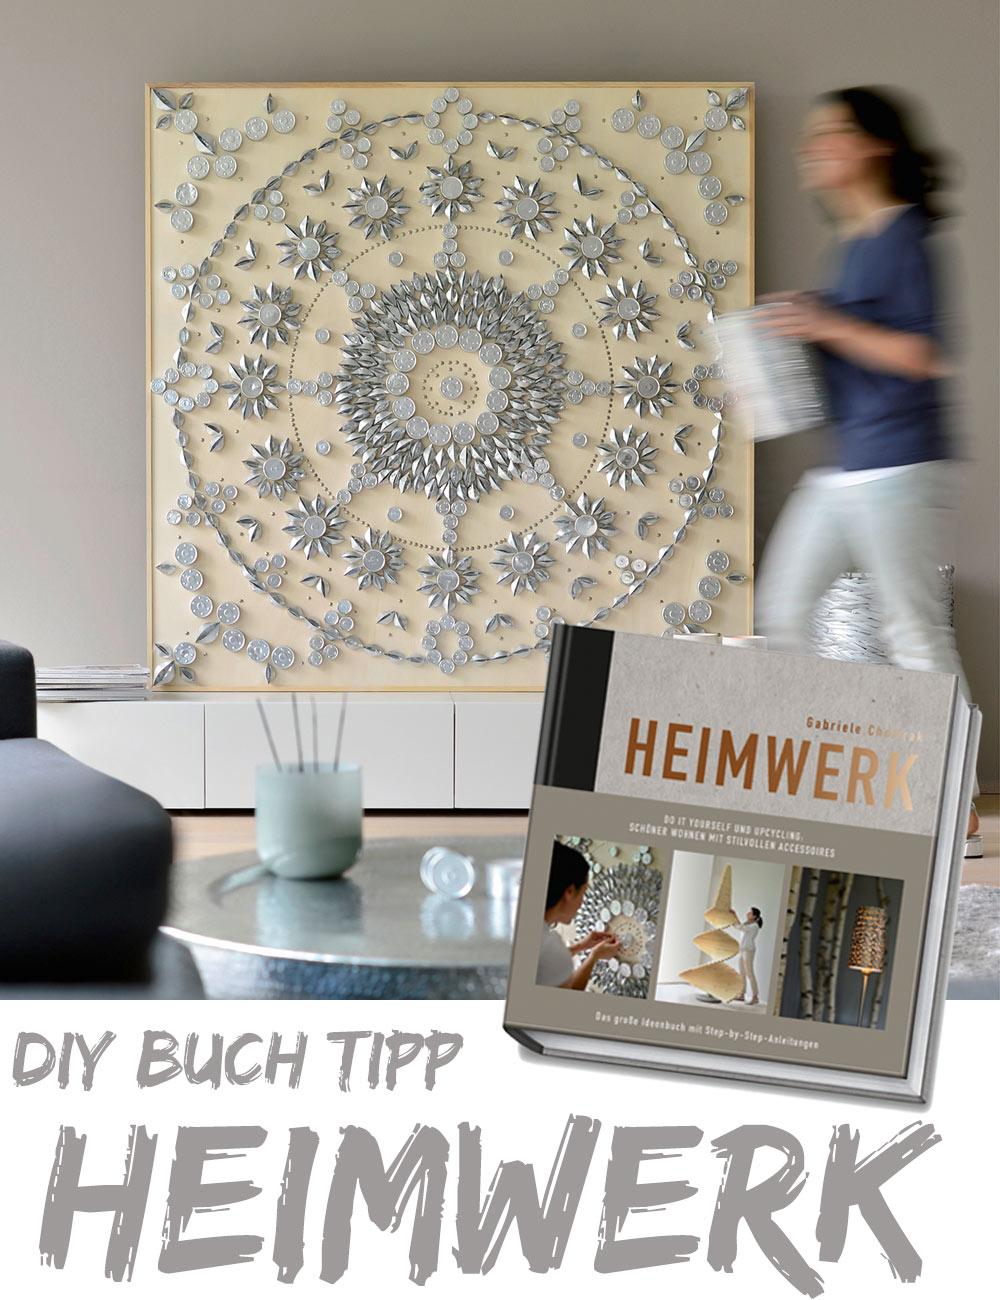 wandbilder selber machen 2630 made house decor. Black Bedroom Furniture Sets. Home Design Ideas